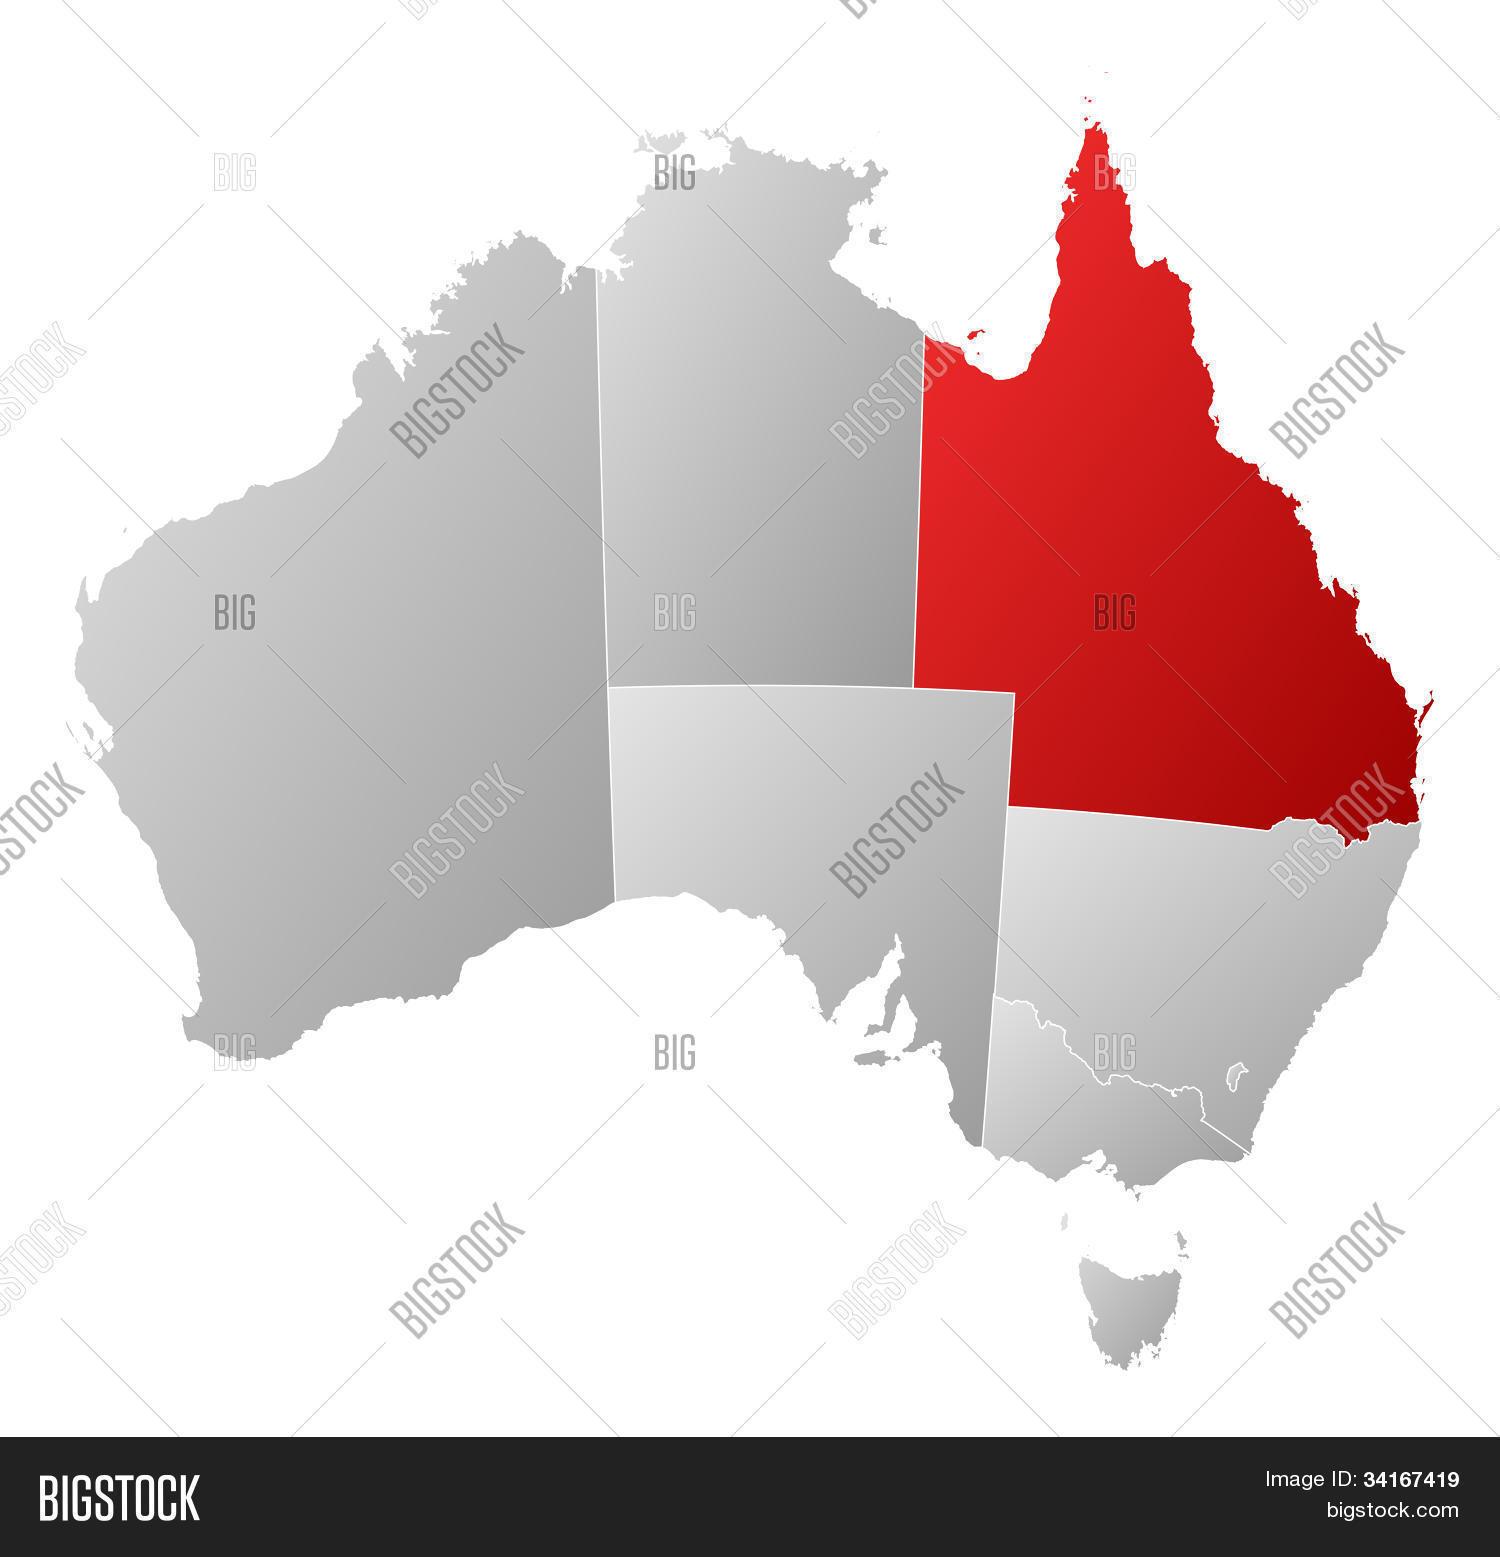 Map Of Australia Highlighting Queensland.Map Australia Image Photo Free Trial Bigstock